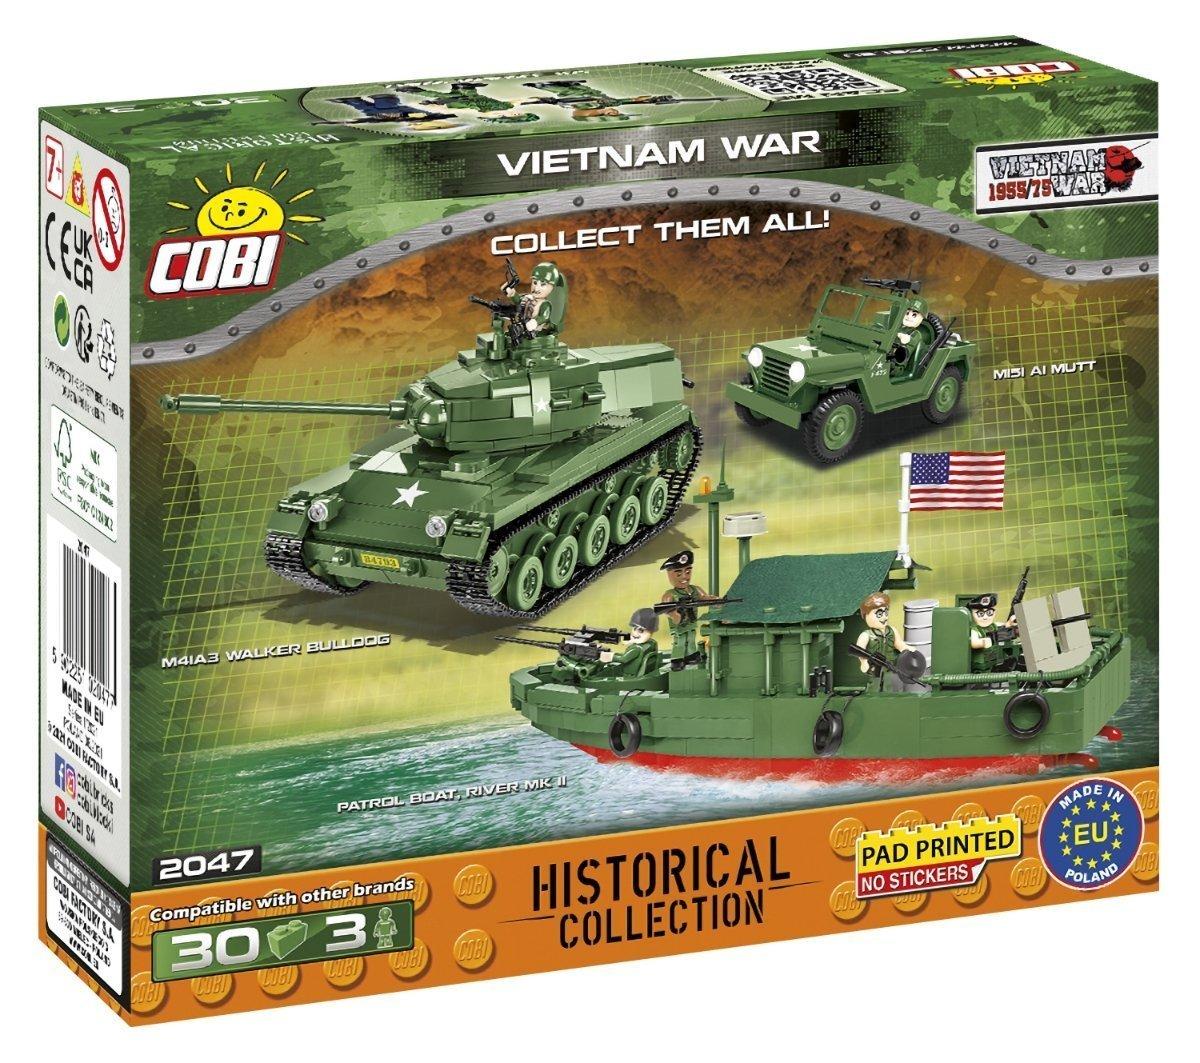 COBI Vietnam War Figure Set 2047 Amazon